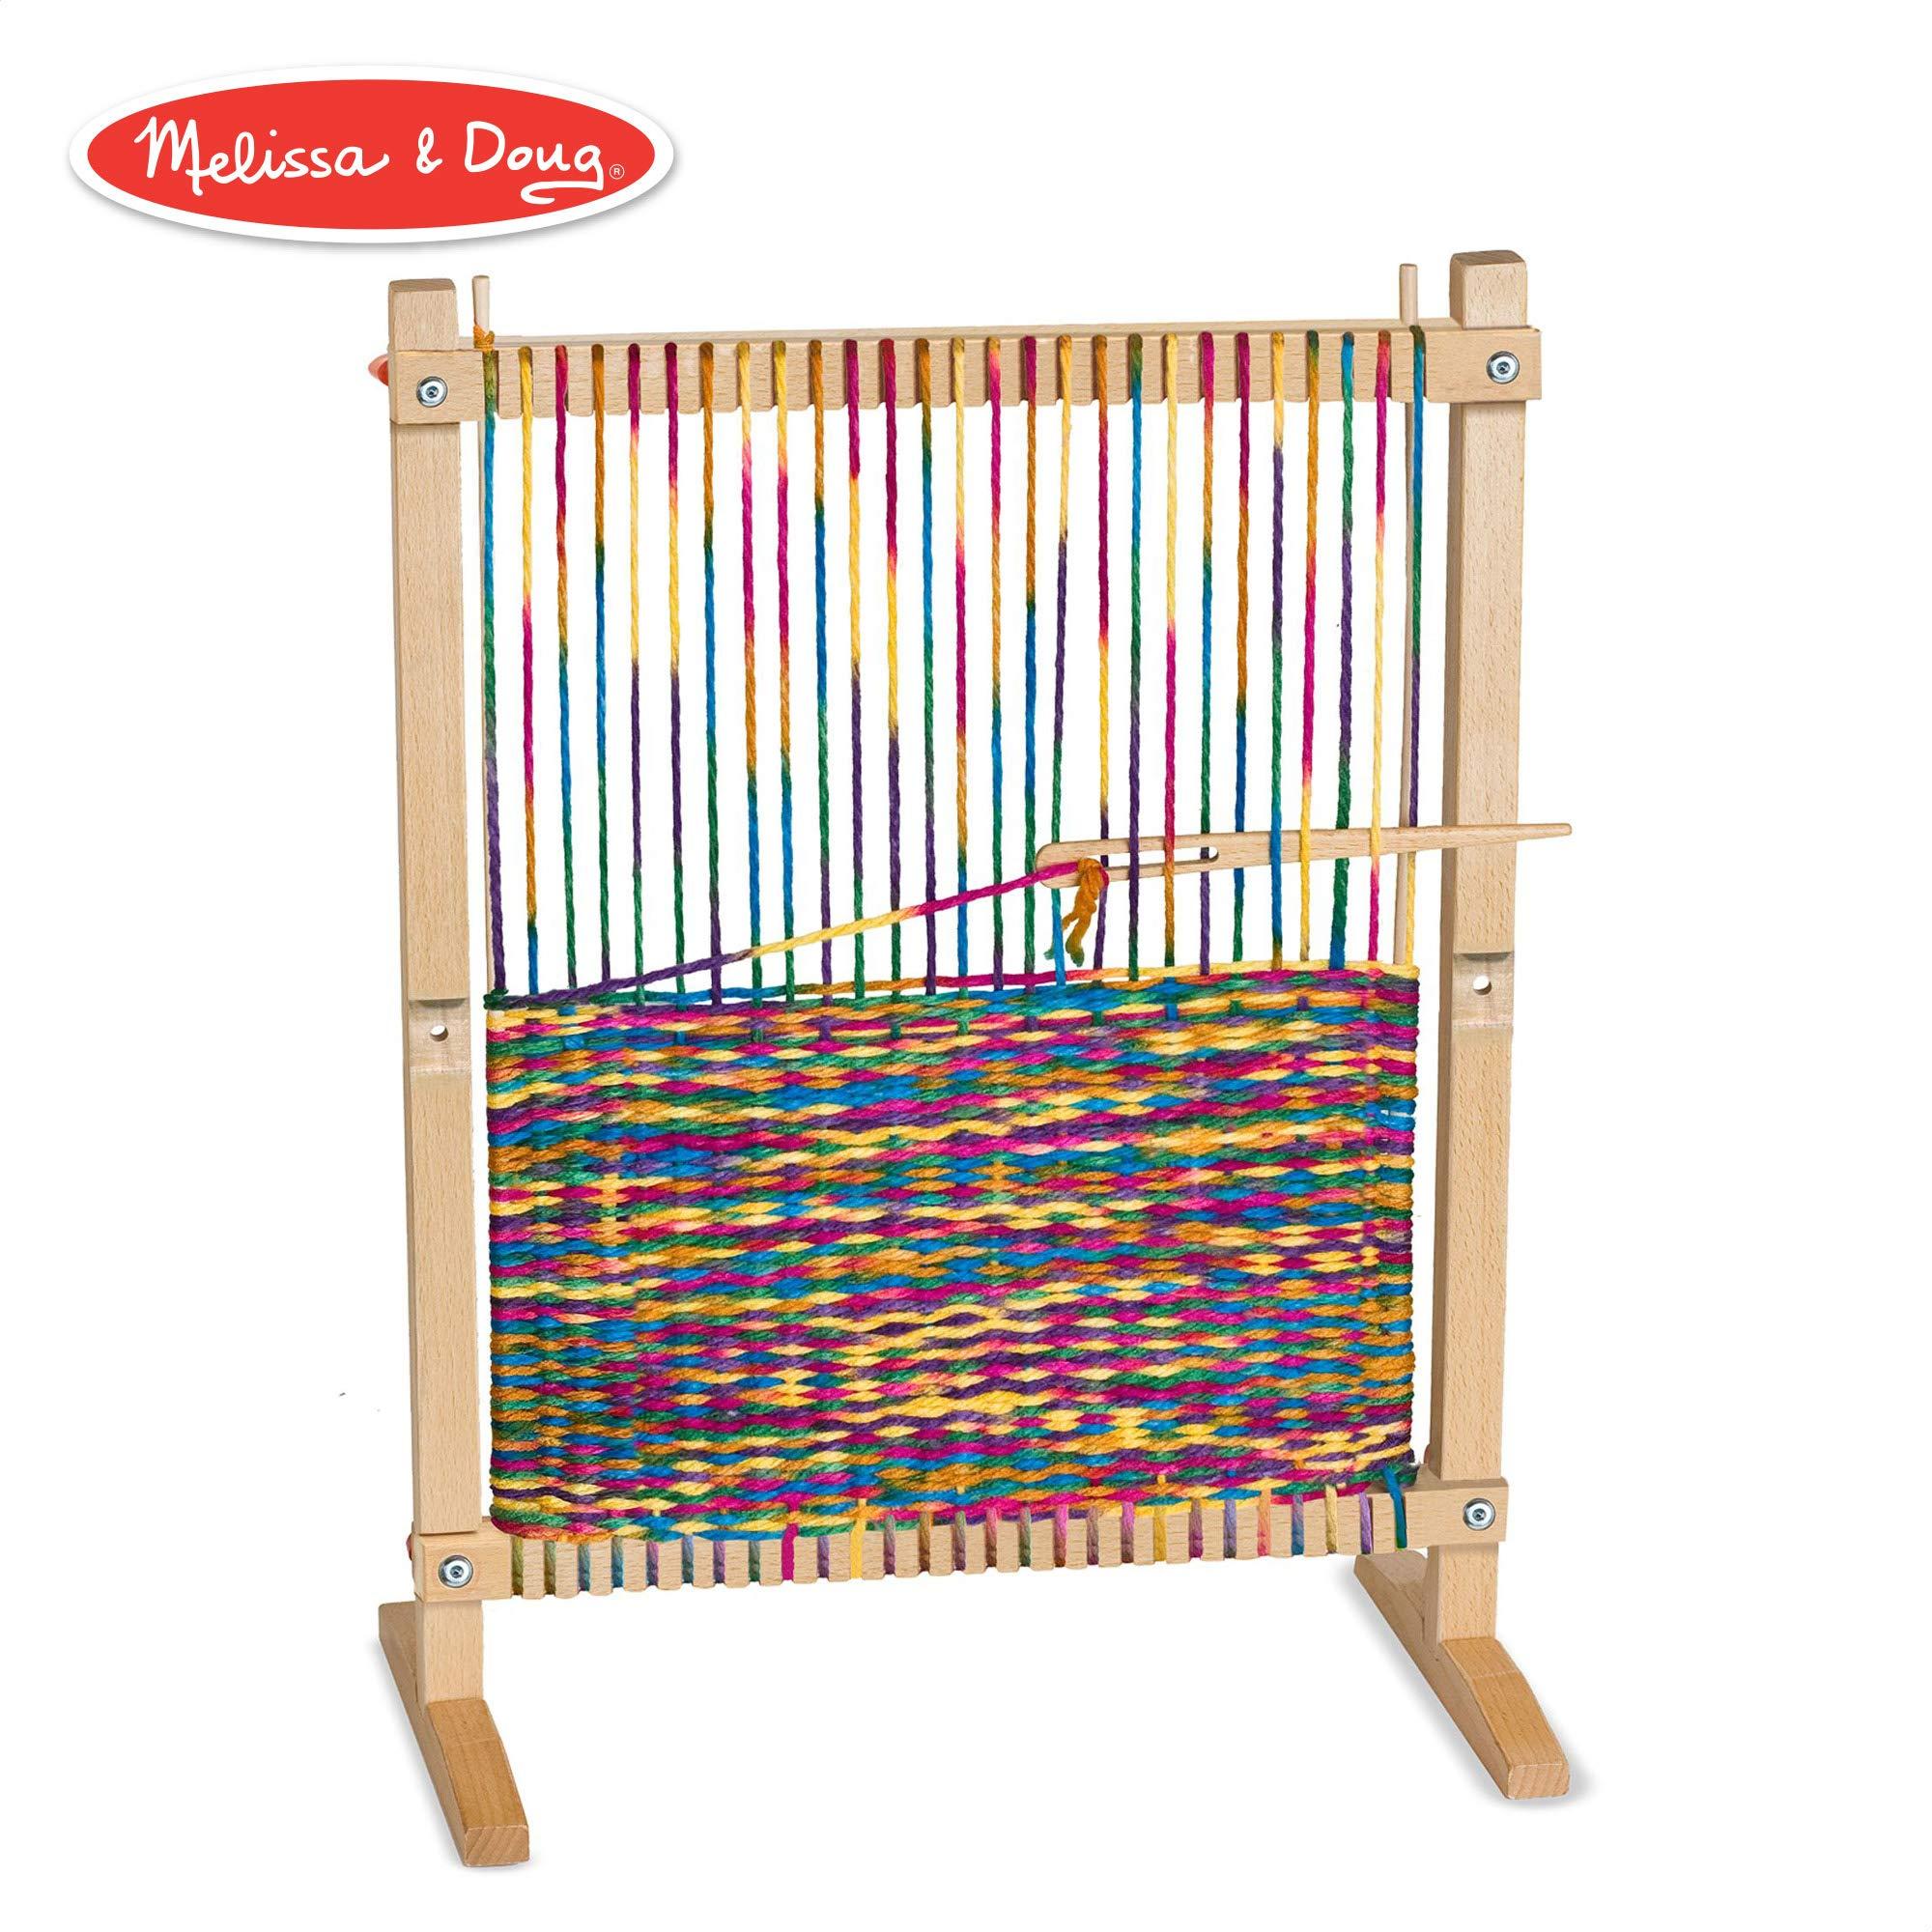 Melissa & Doug Wooden Multi-Craft Weaving Loom (Arts & Crafts, Extra-Large Frame, Develops Creativity and Motor Skills, 16.5'' H x 22.75'' W x 9.5'' L)